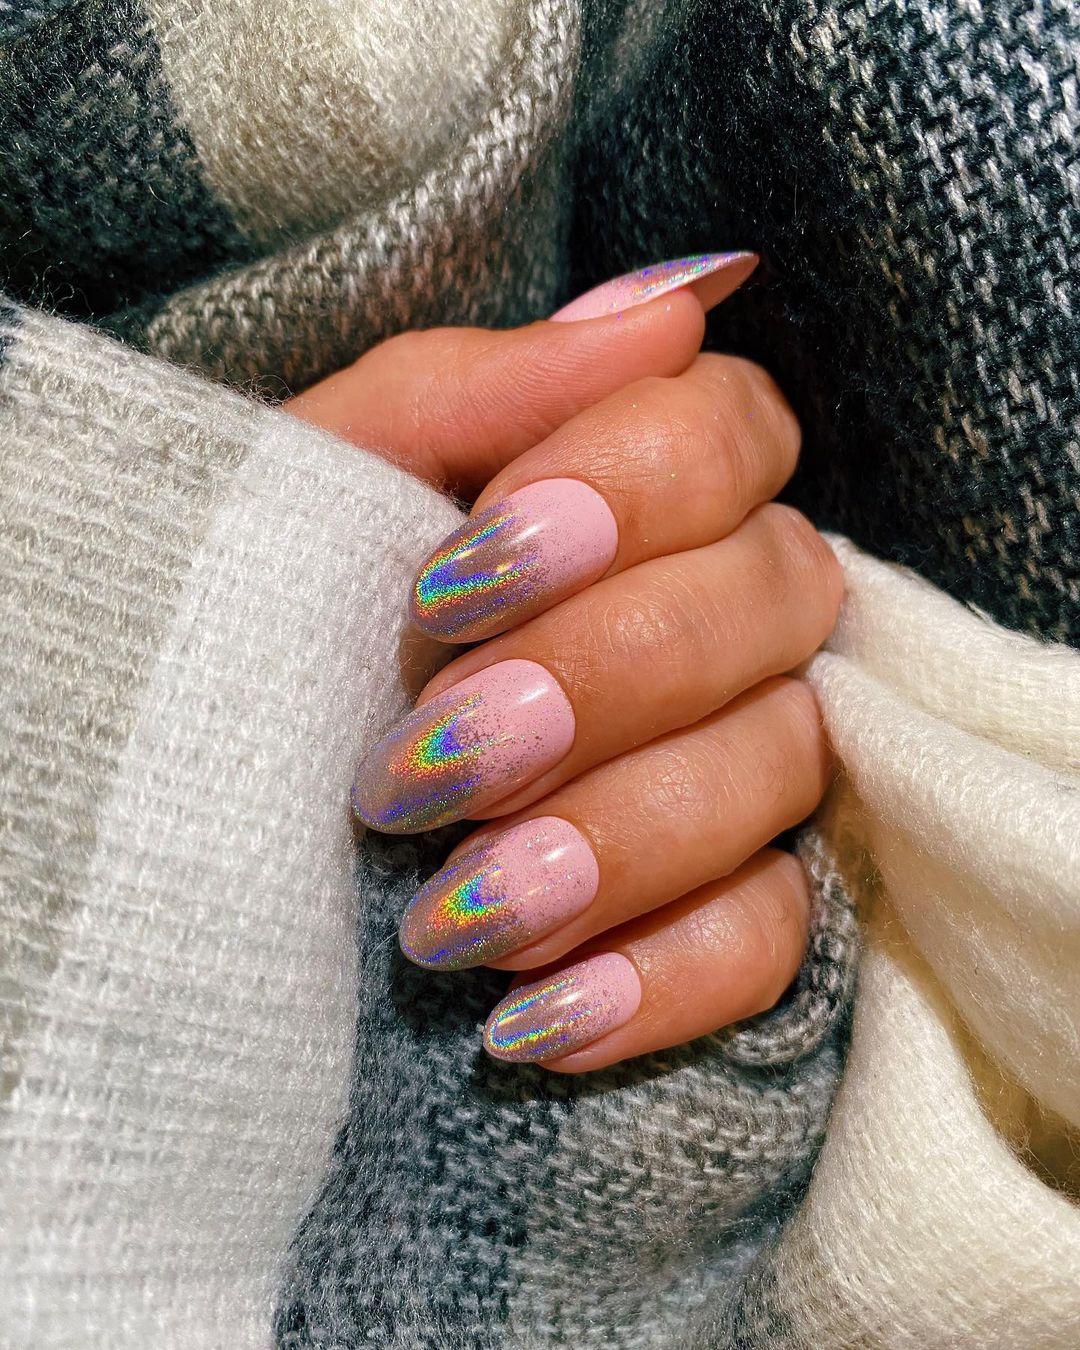 Current Unicorn Nail Designs